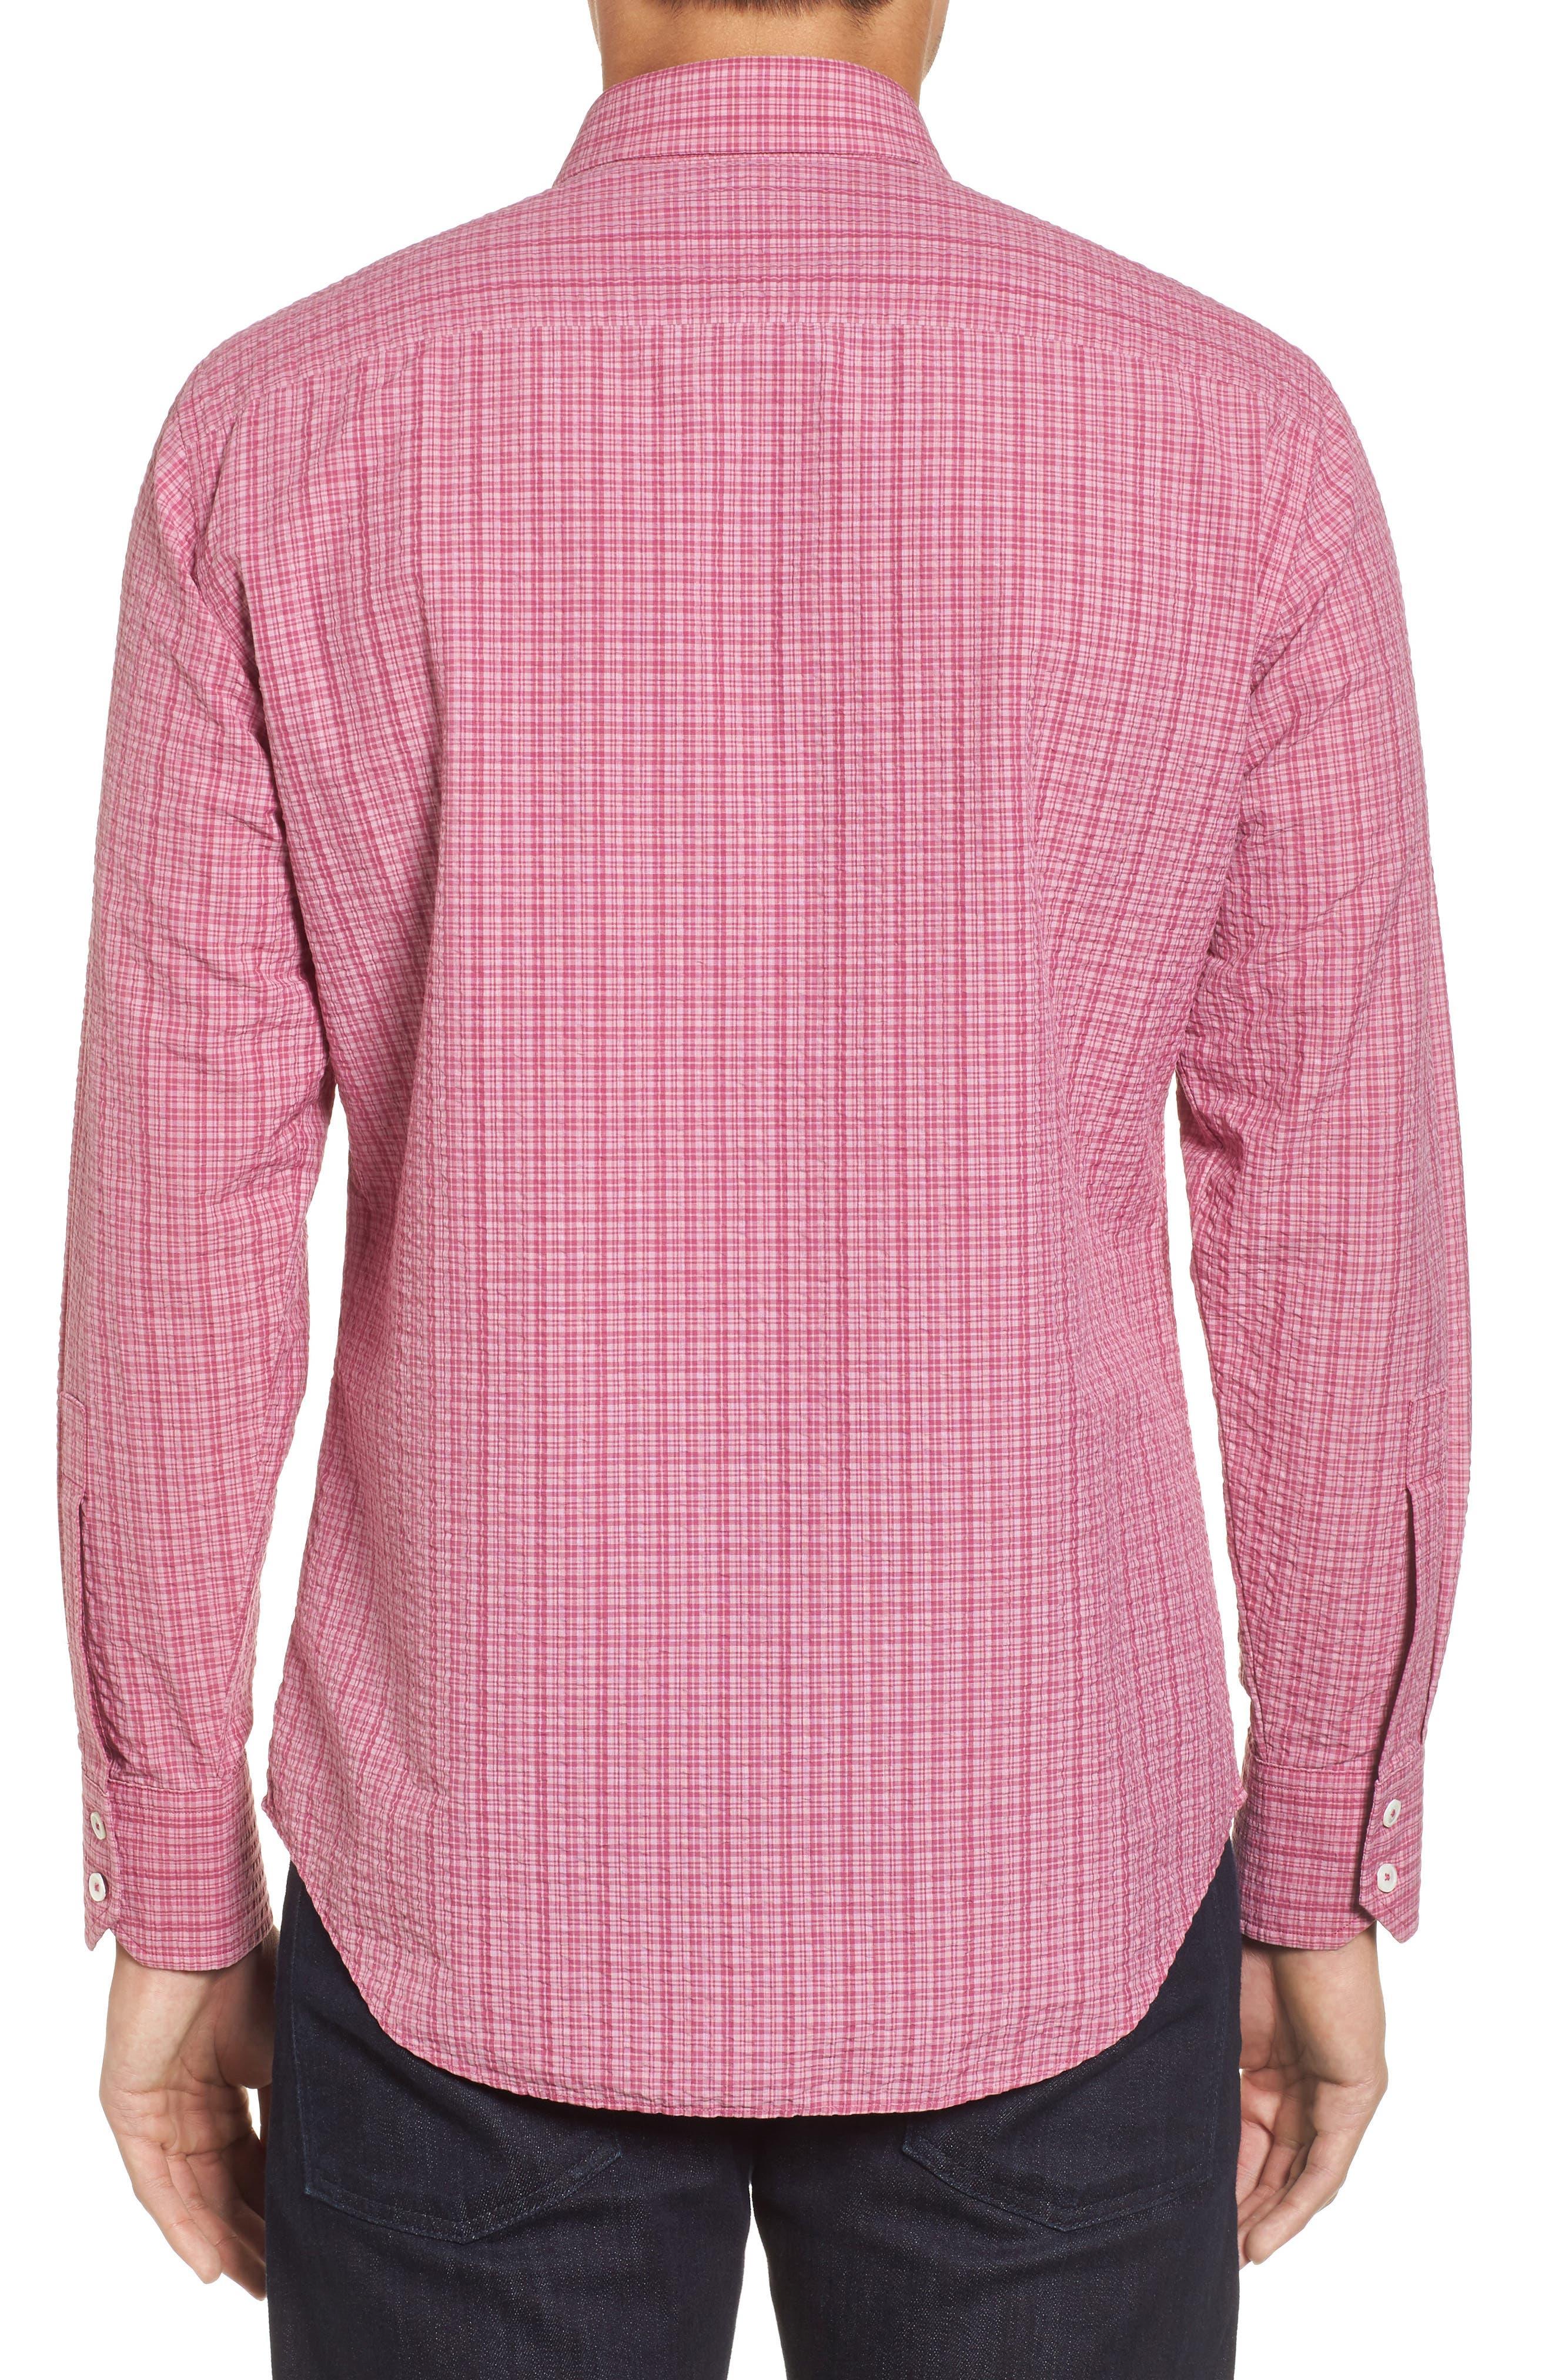 Italo Seersucker Woven Sport Shirt,                             Alternate thumbnail 2, color,                             Dark Pink